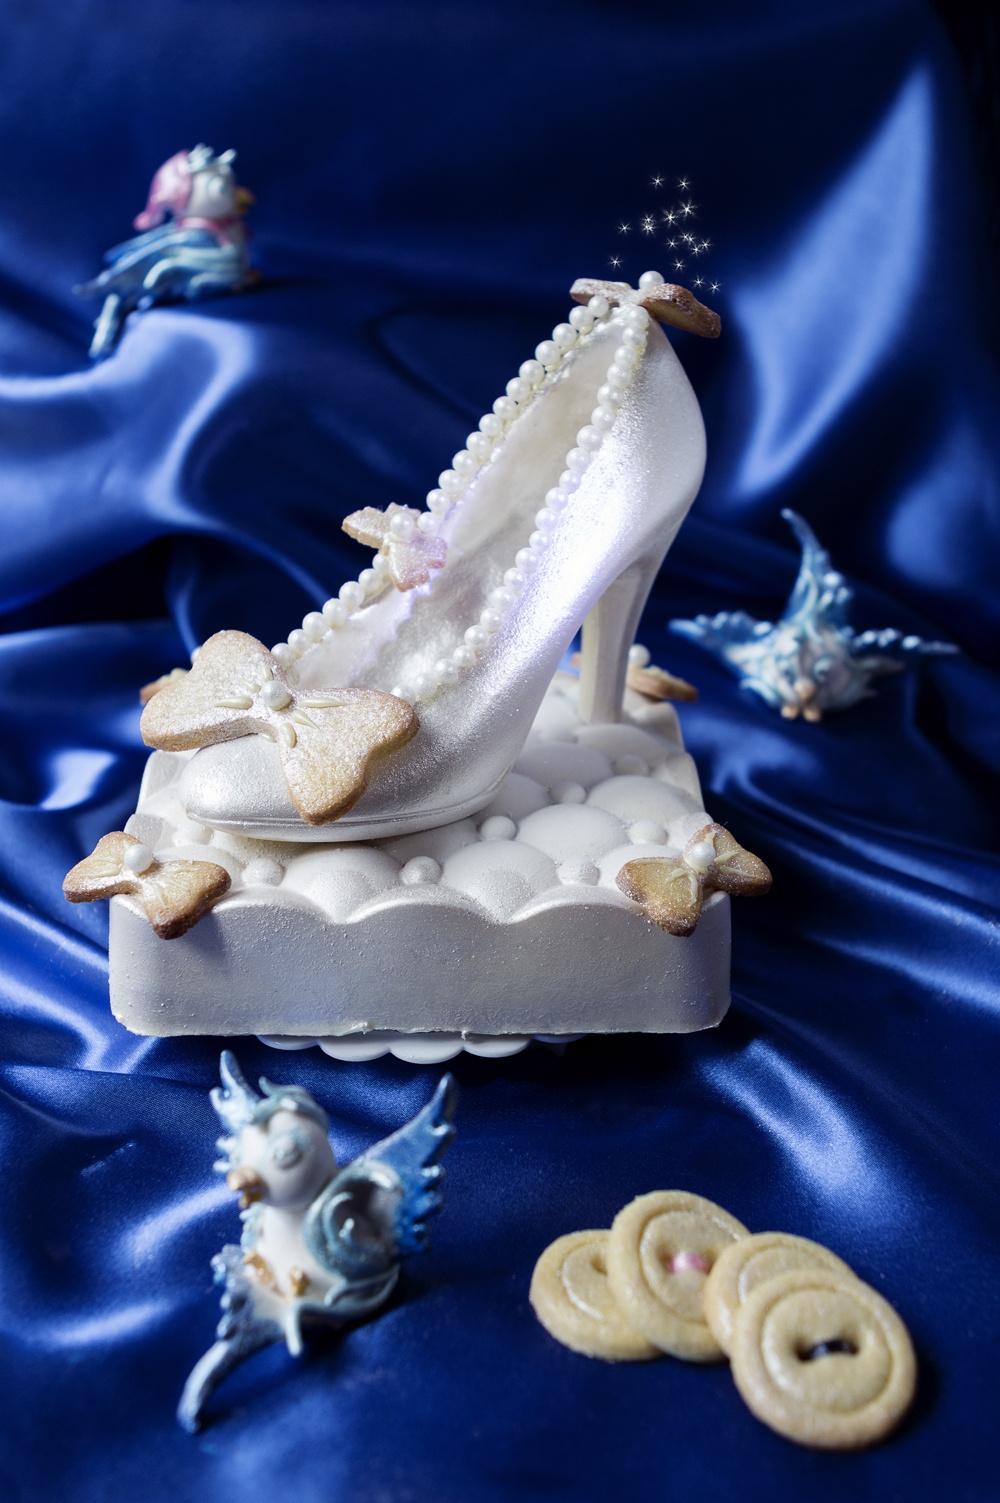 Gâteau Cendrillon - Cinderella cake - studio de création - Qui a volé les tartes